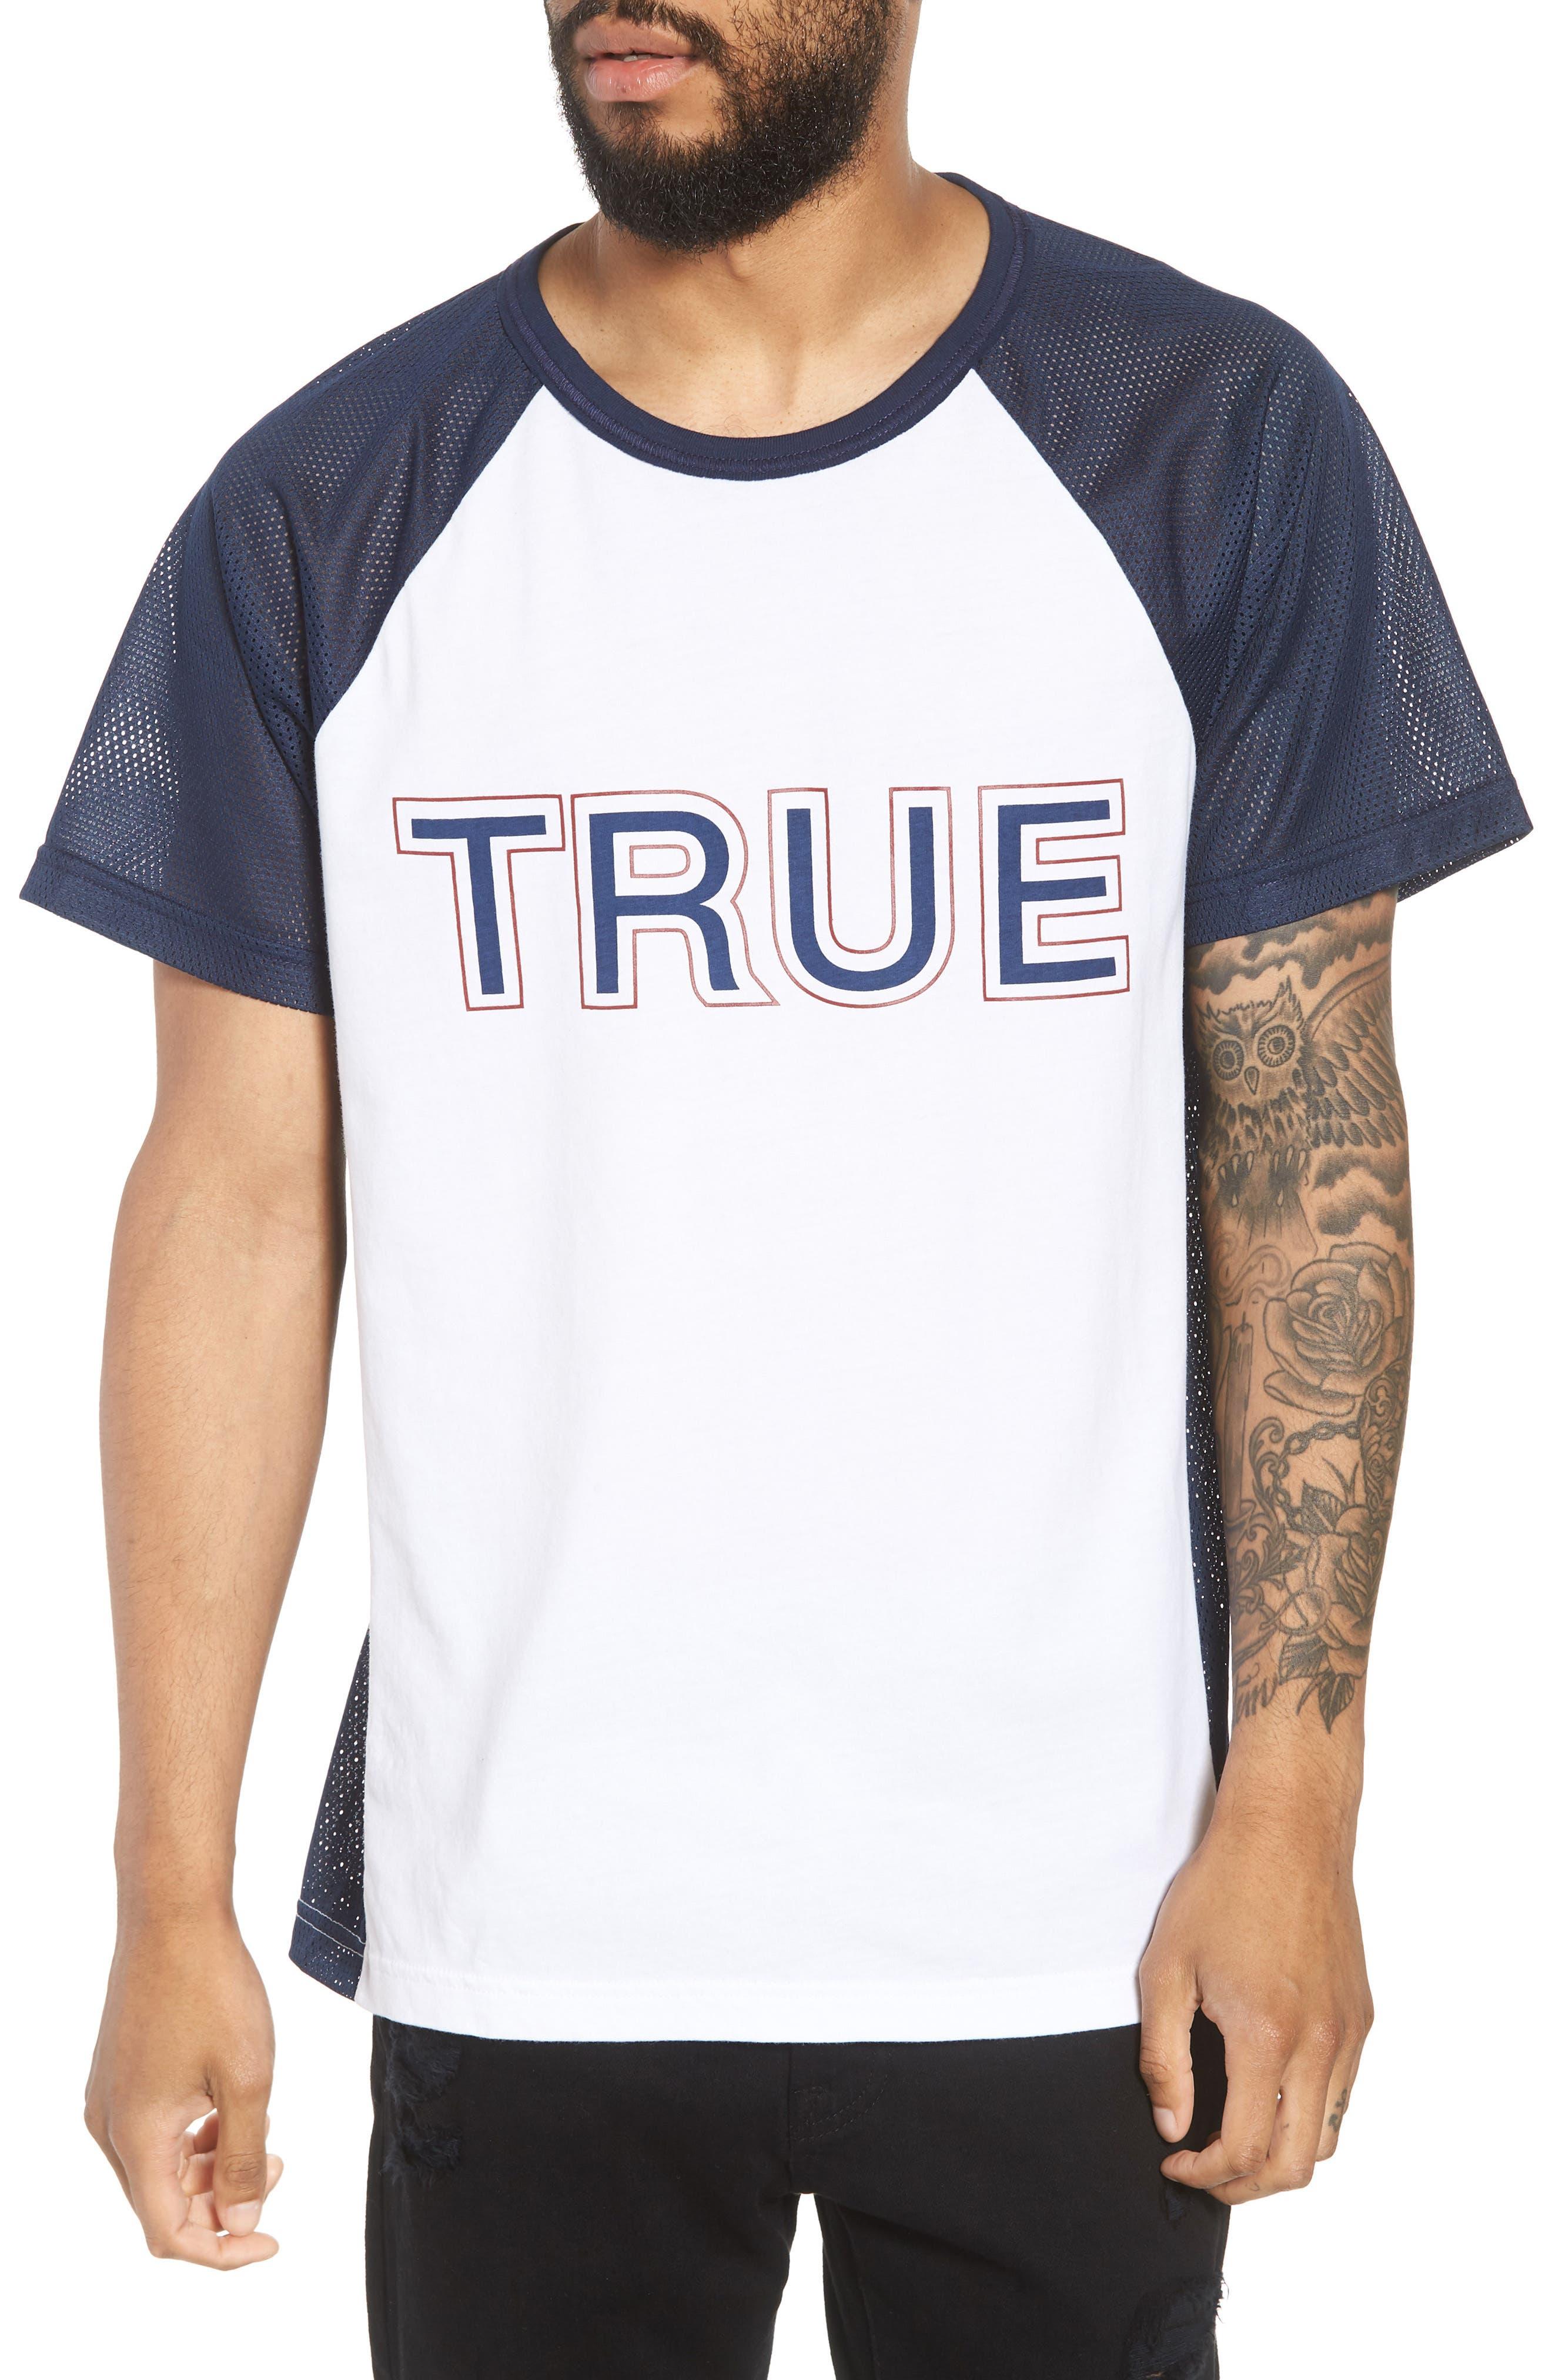 Contrast Raglan T-Shirt,                             Main thumbnail 1, color,                             Ace Blue/ Optic White Combo